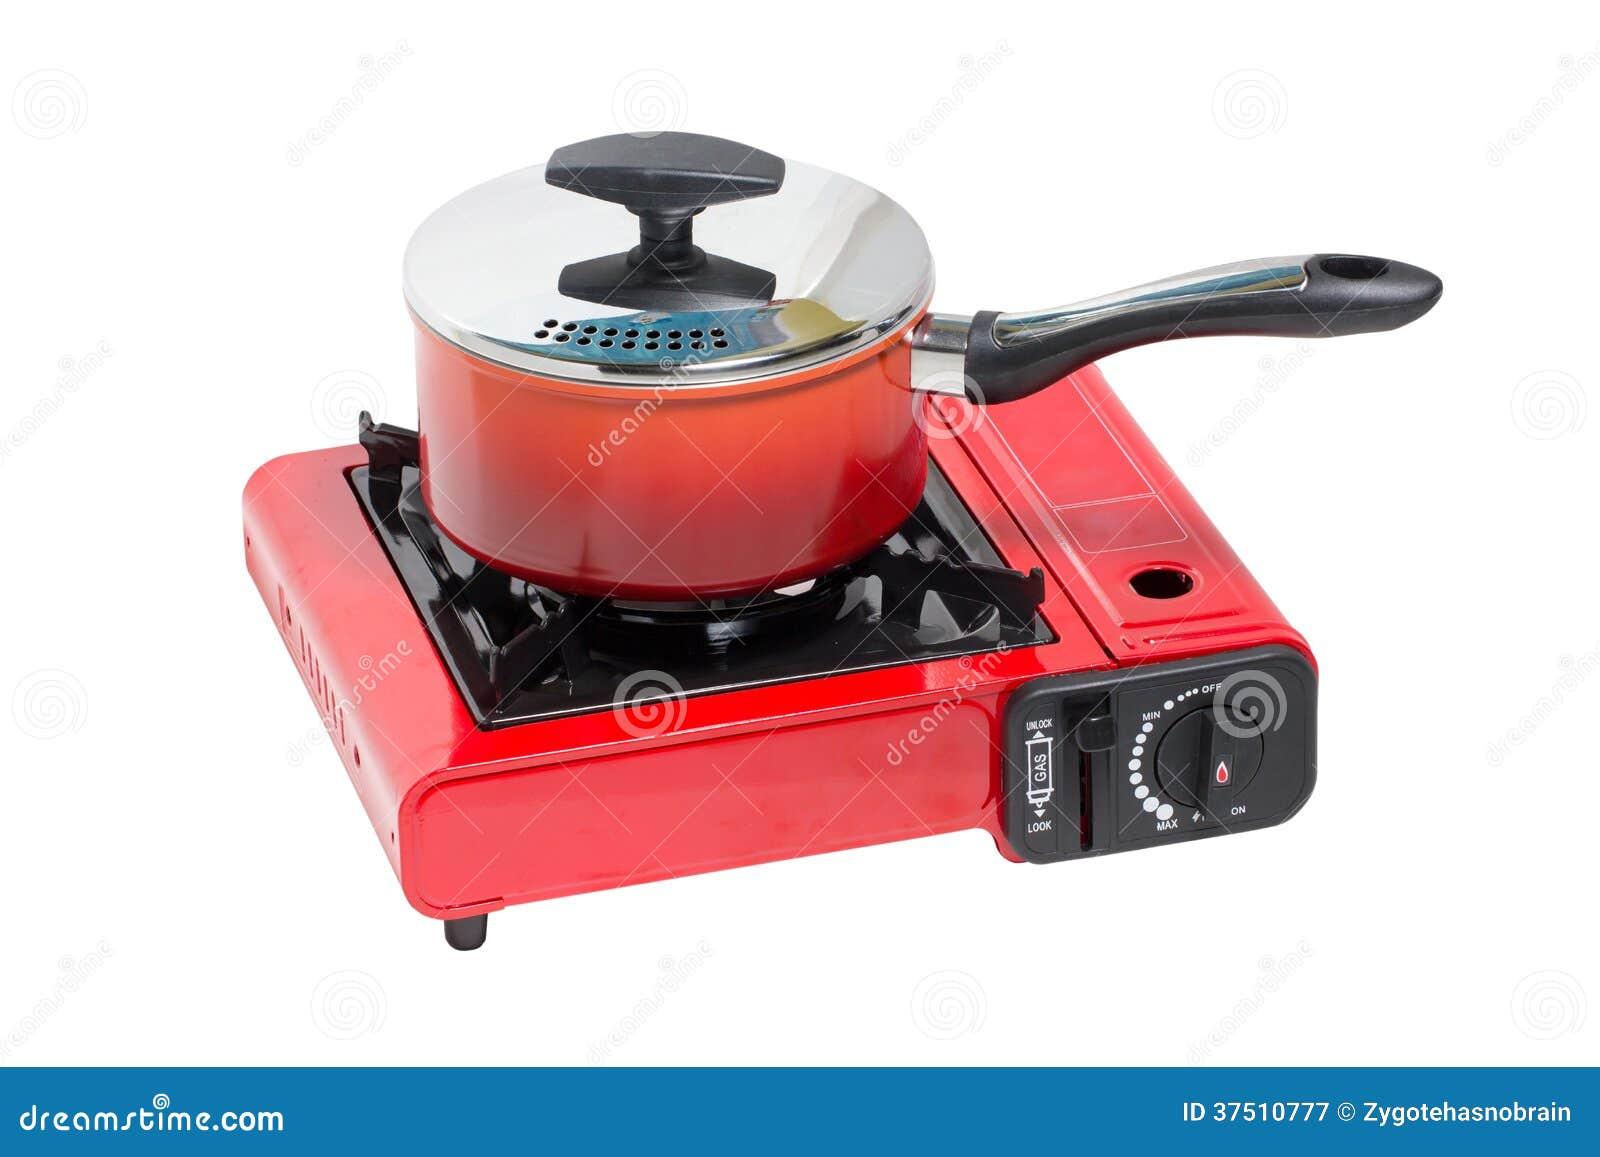 Non Stick Pot On Portable Gas Stove Stock Image Image